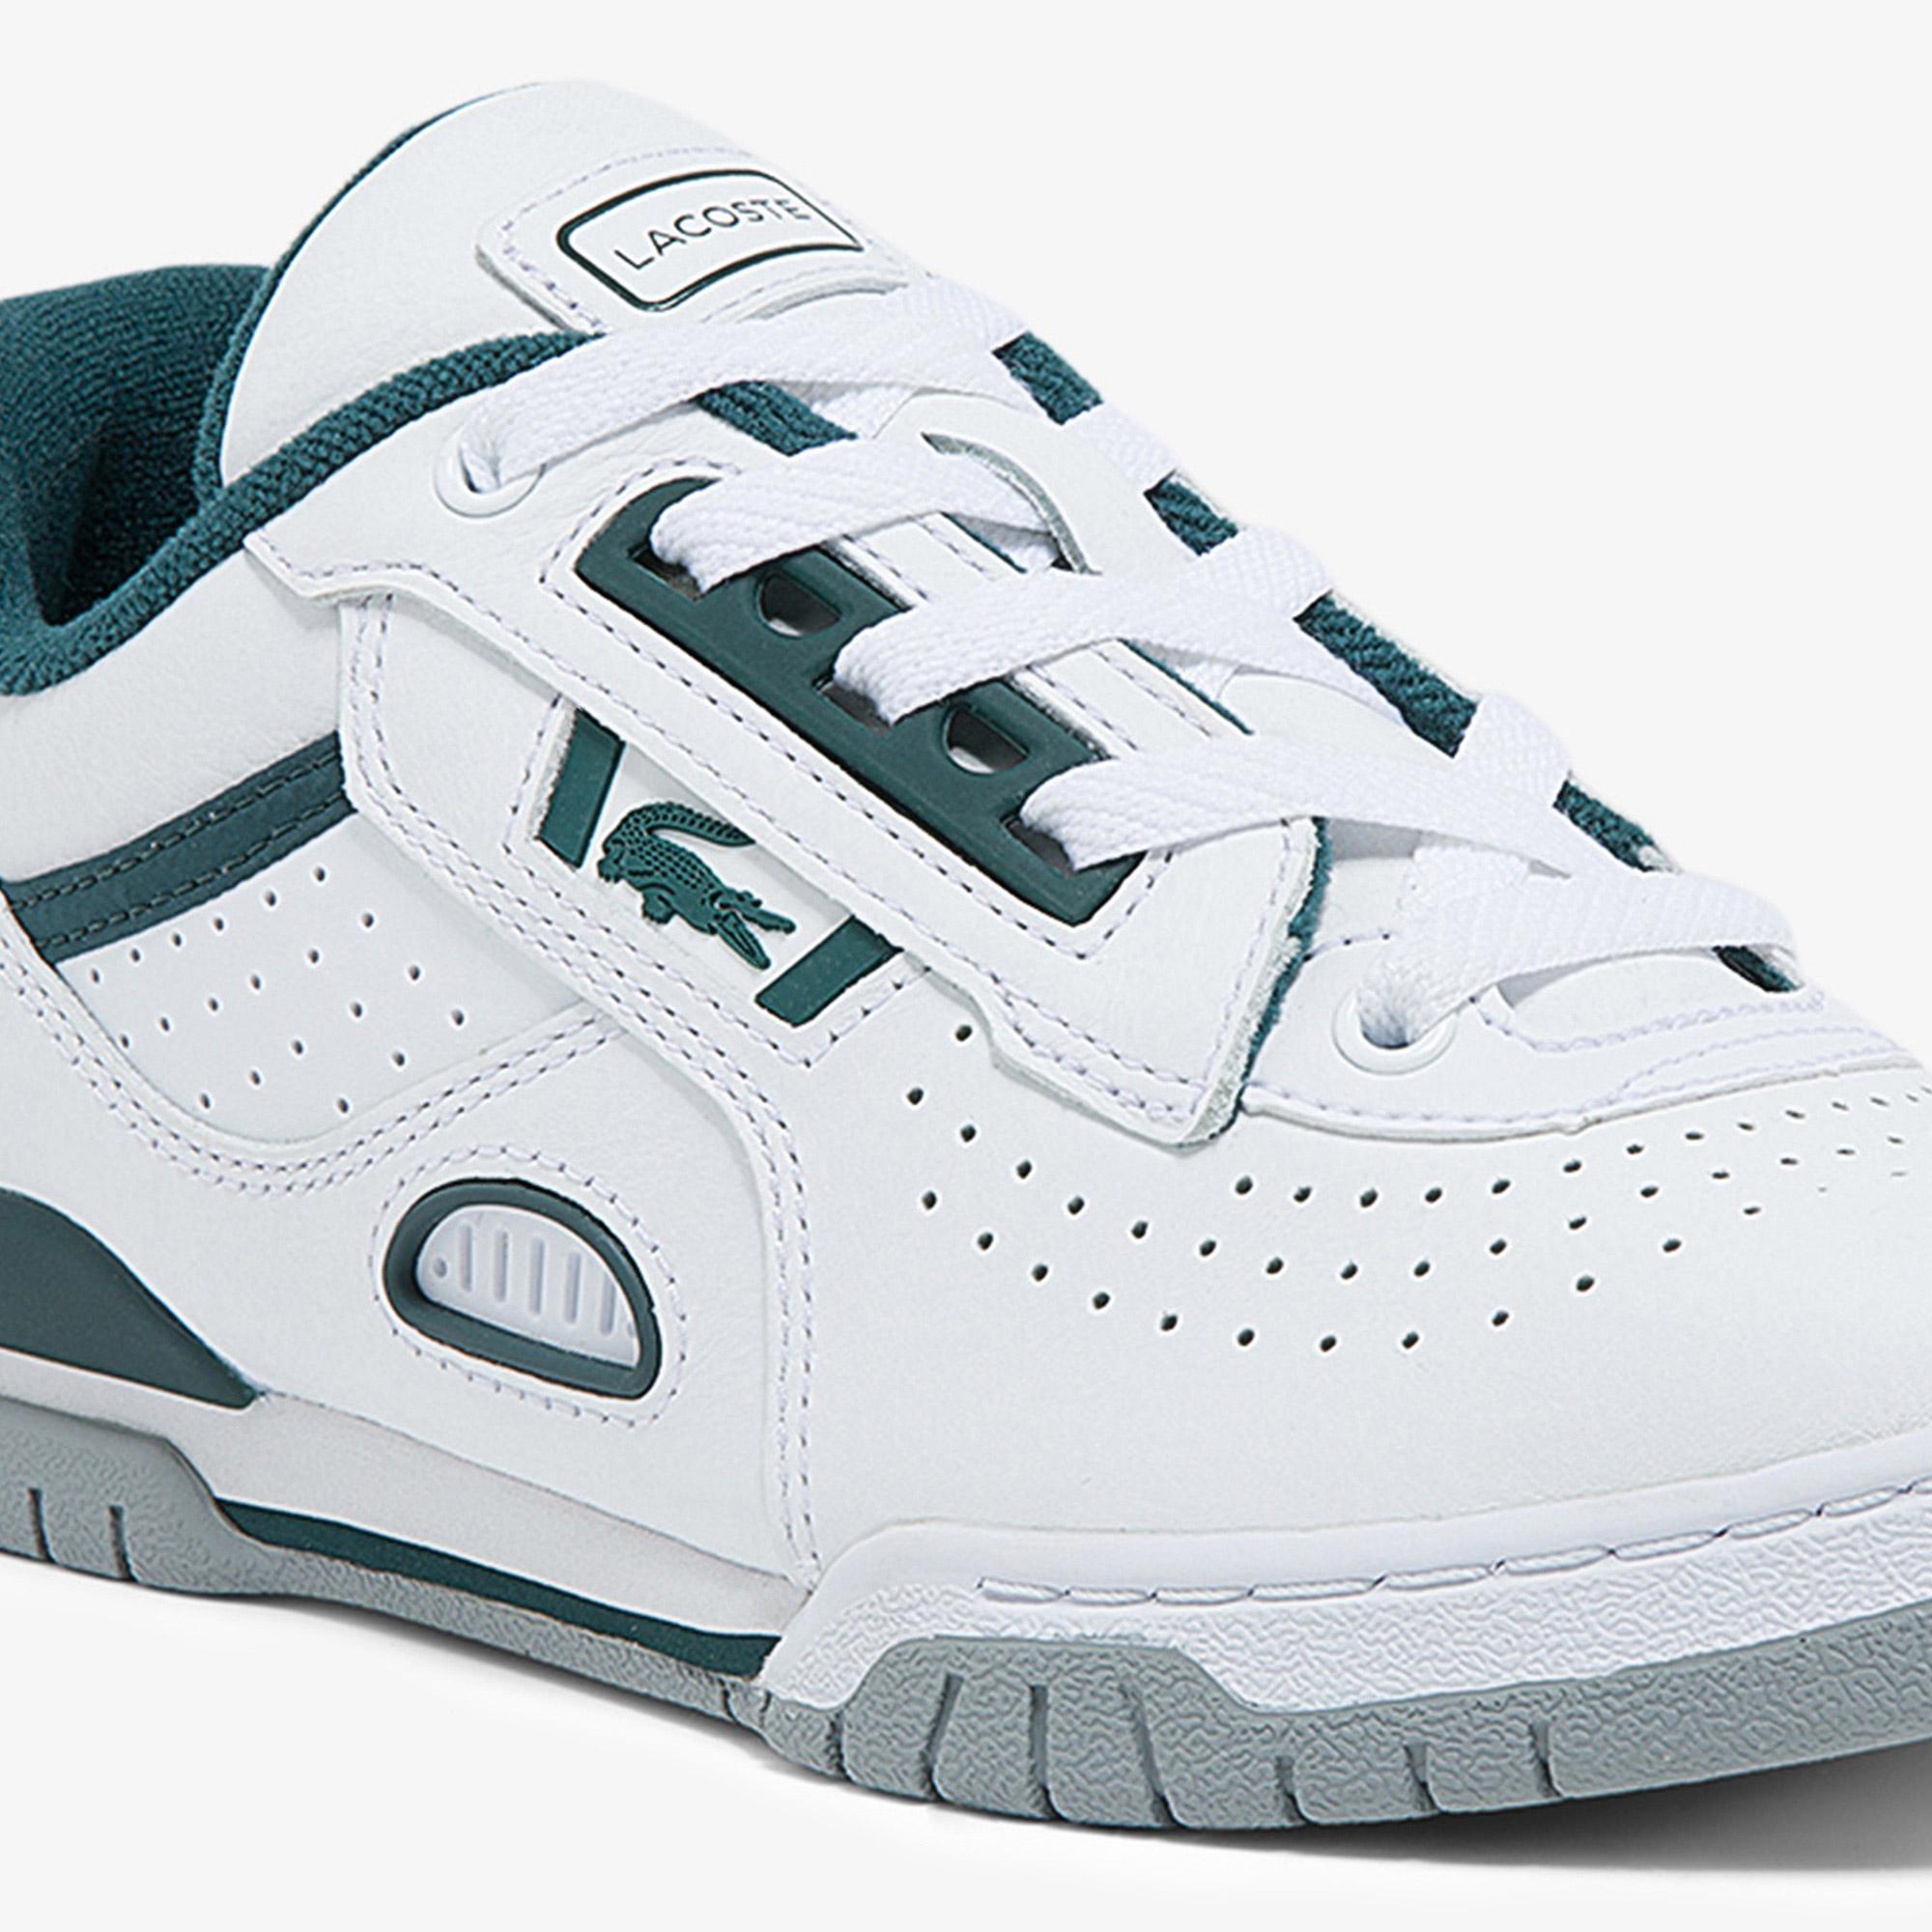 Lacoste Women's M89 OG Sneakers